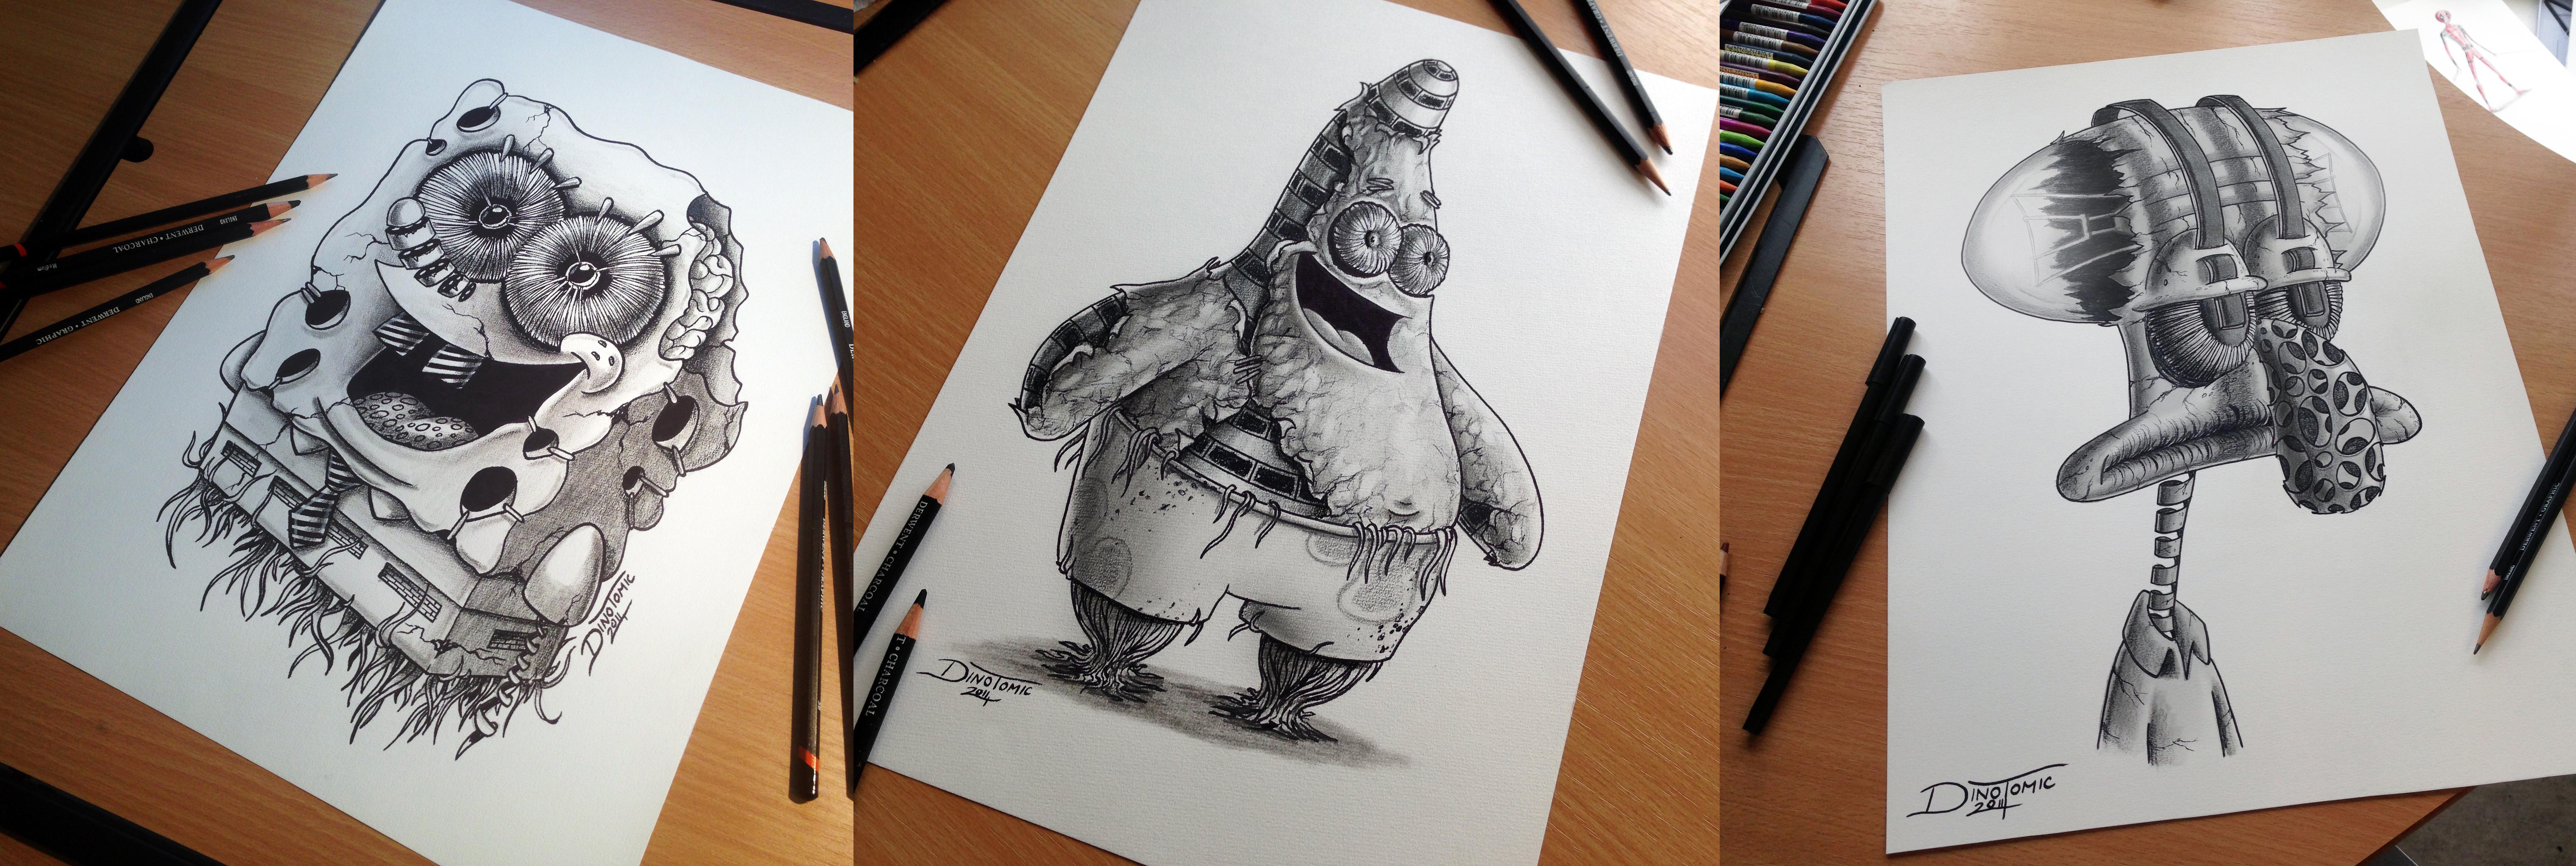 Spongebob / Patrick / Tadeus Pencil Drawing by AtomiccircuS